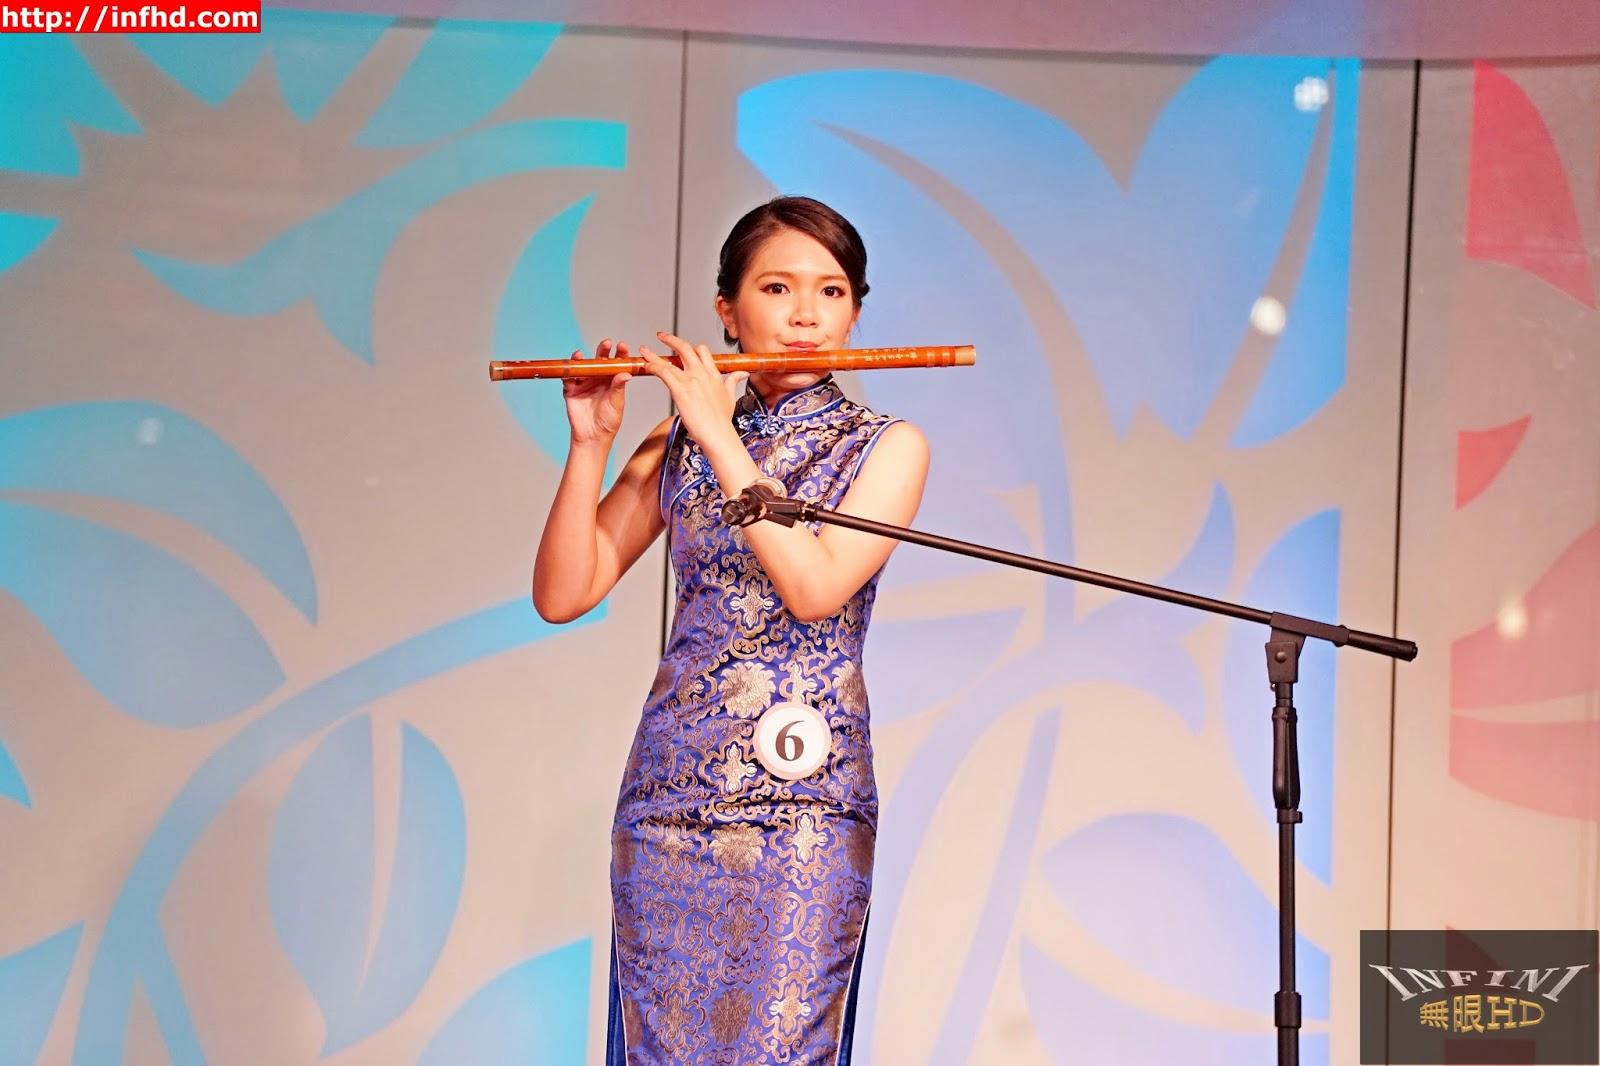 Taiwanese beauty pageants - Focus Taiwan